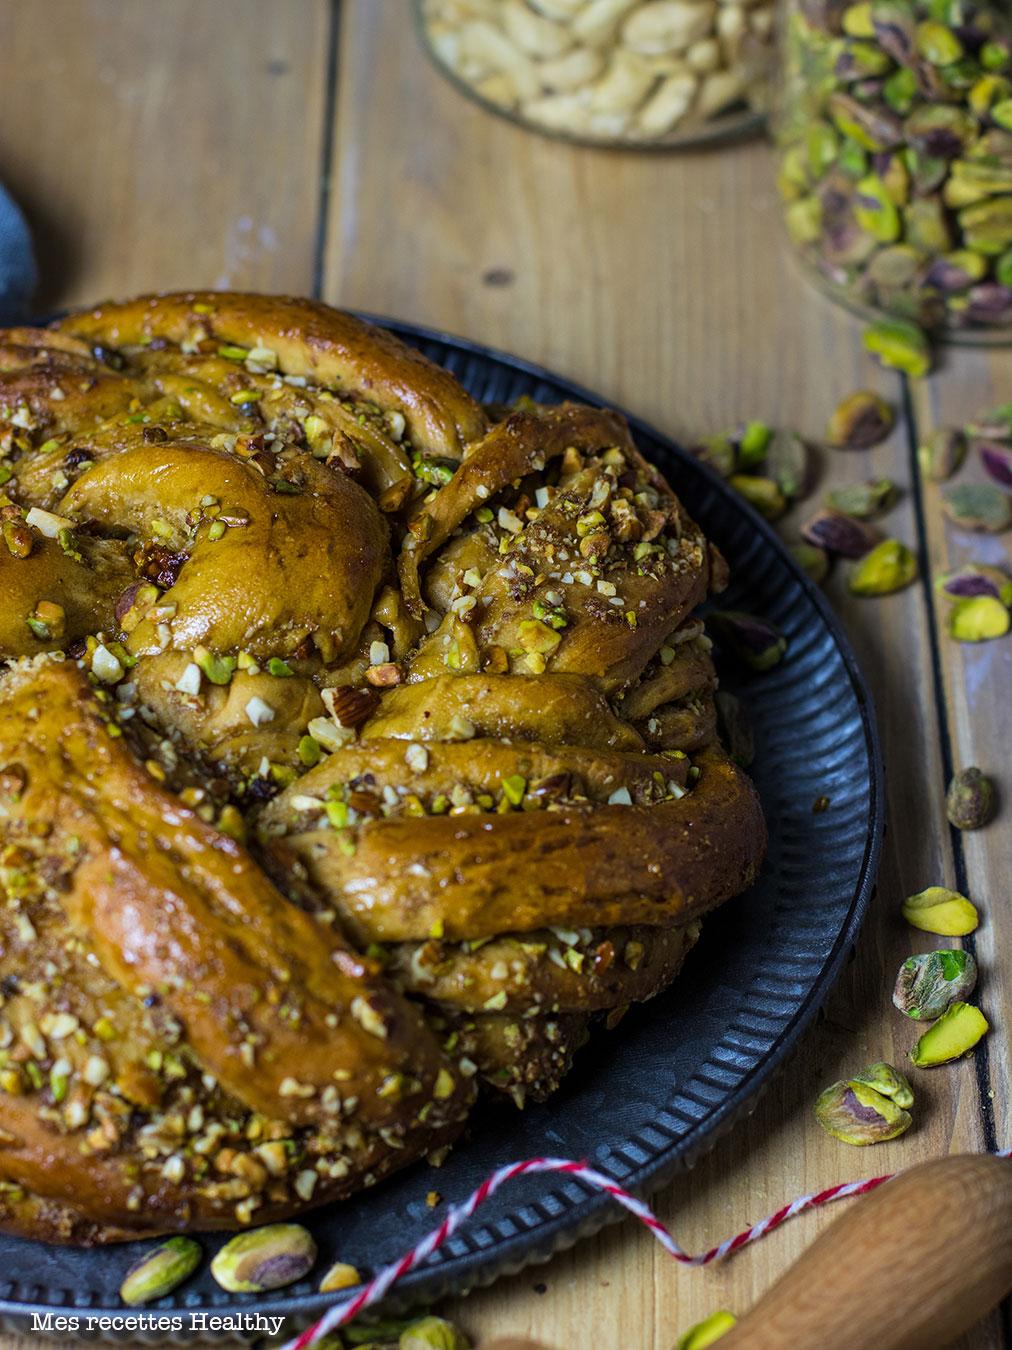 recette healthy-babka pistache-amande